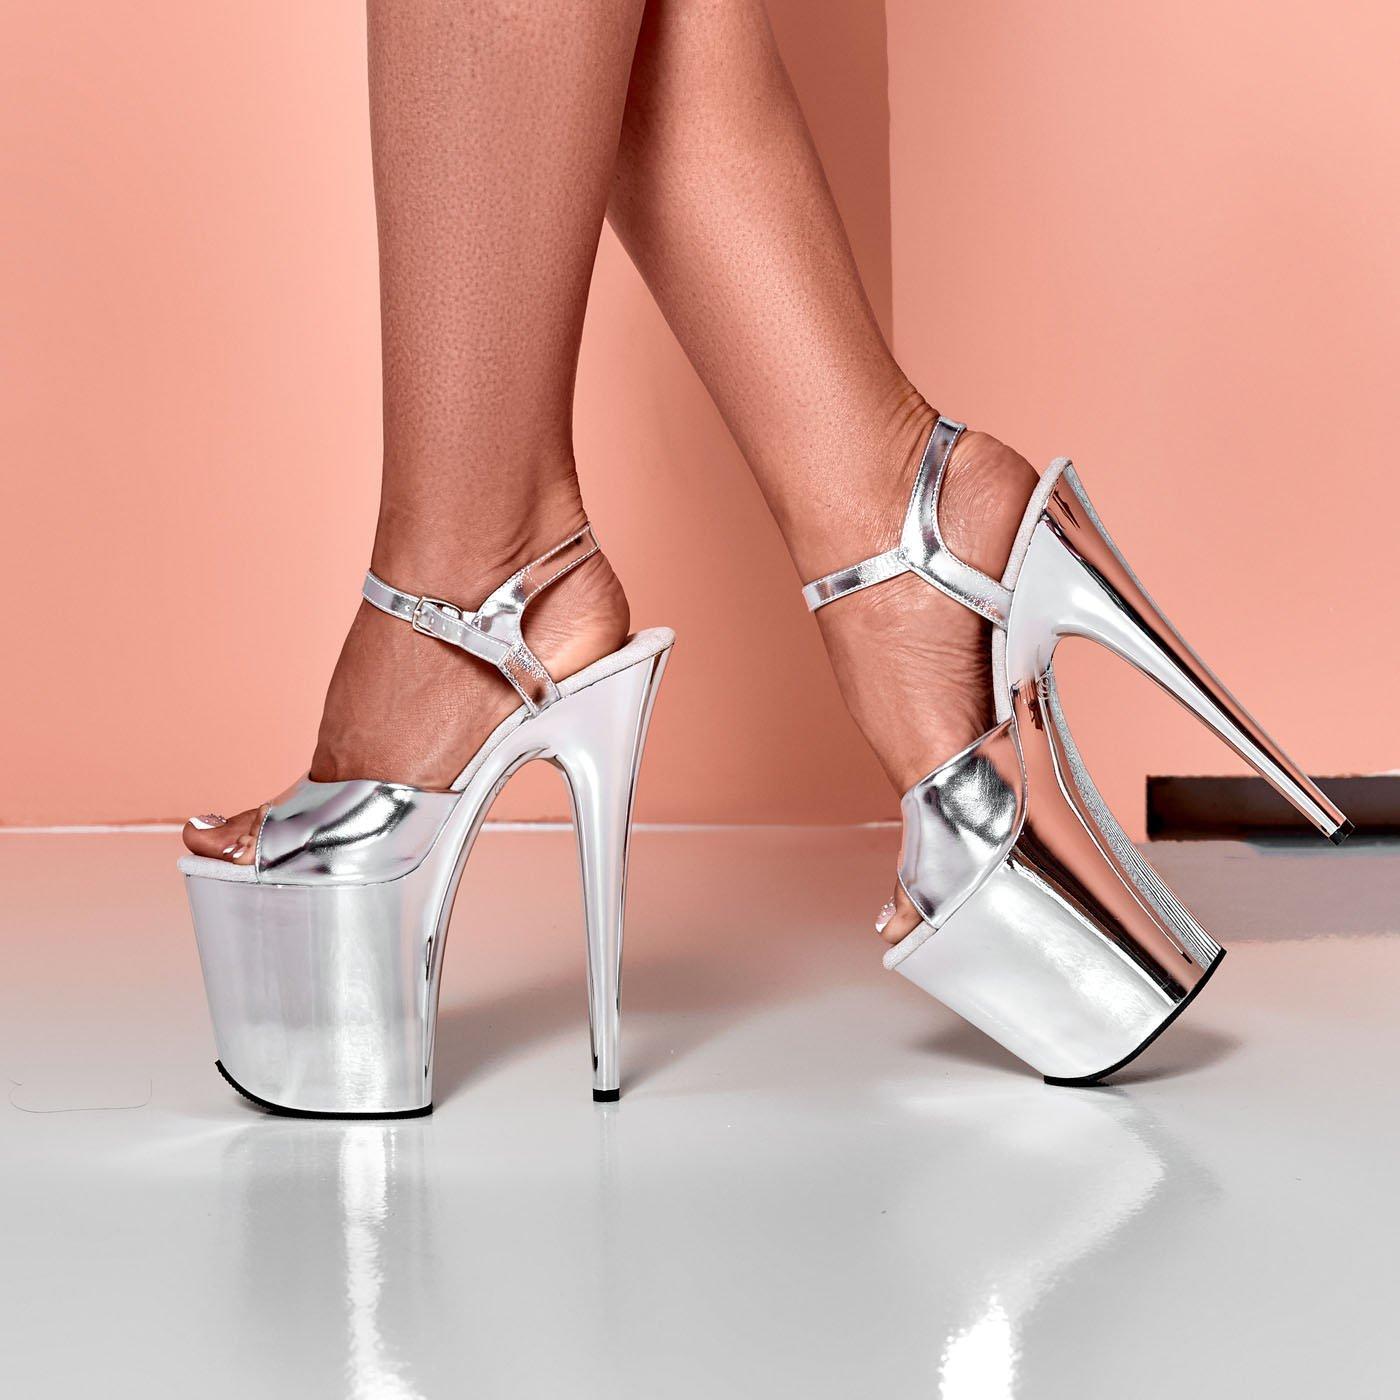 Фото 1 - Ноги девушки в серебристых стрипах